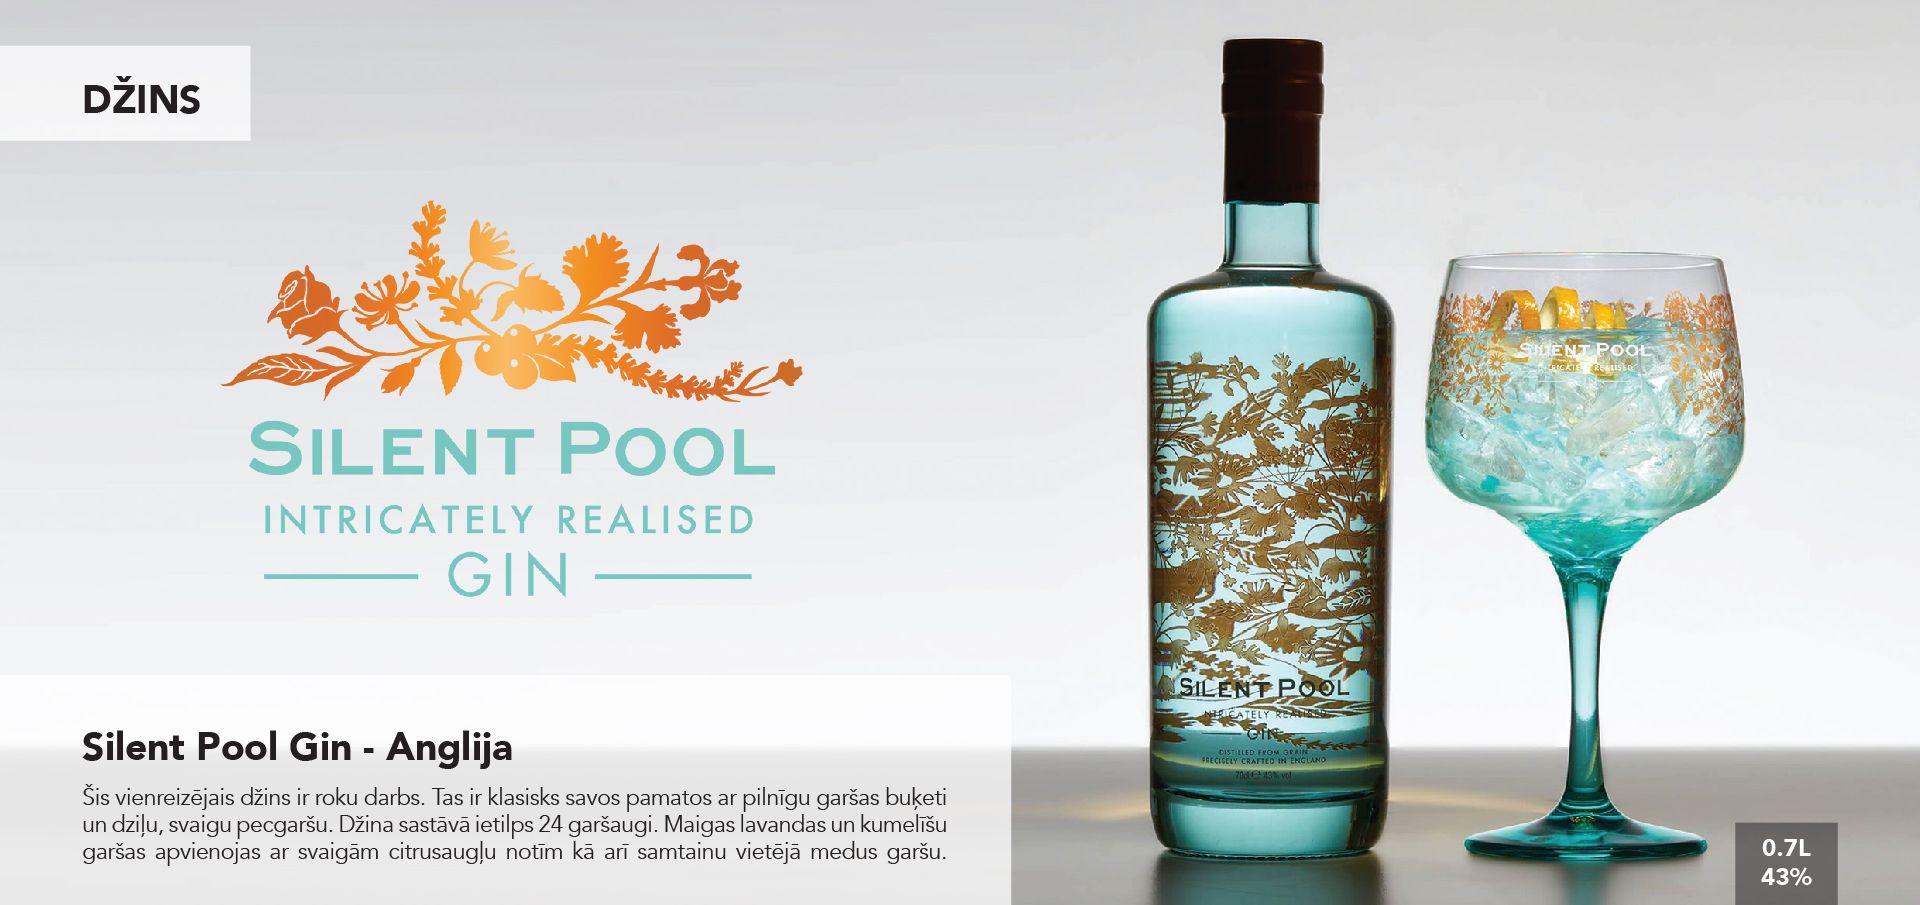 Silent Pool Gin - Anglija